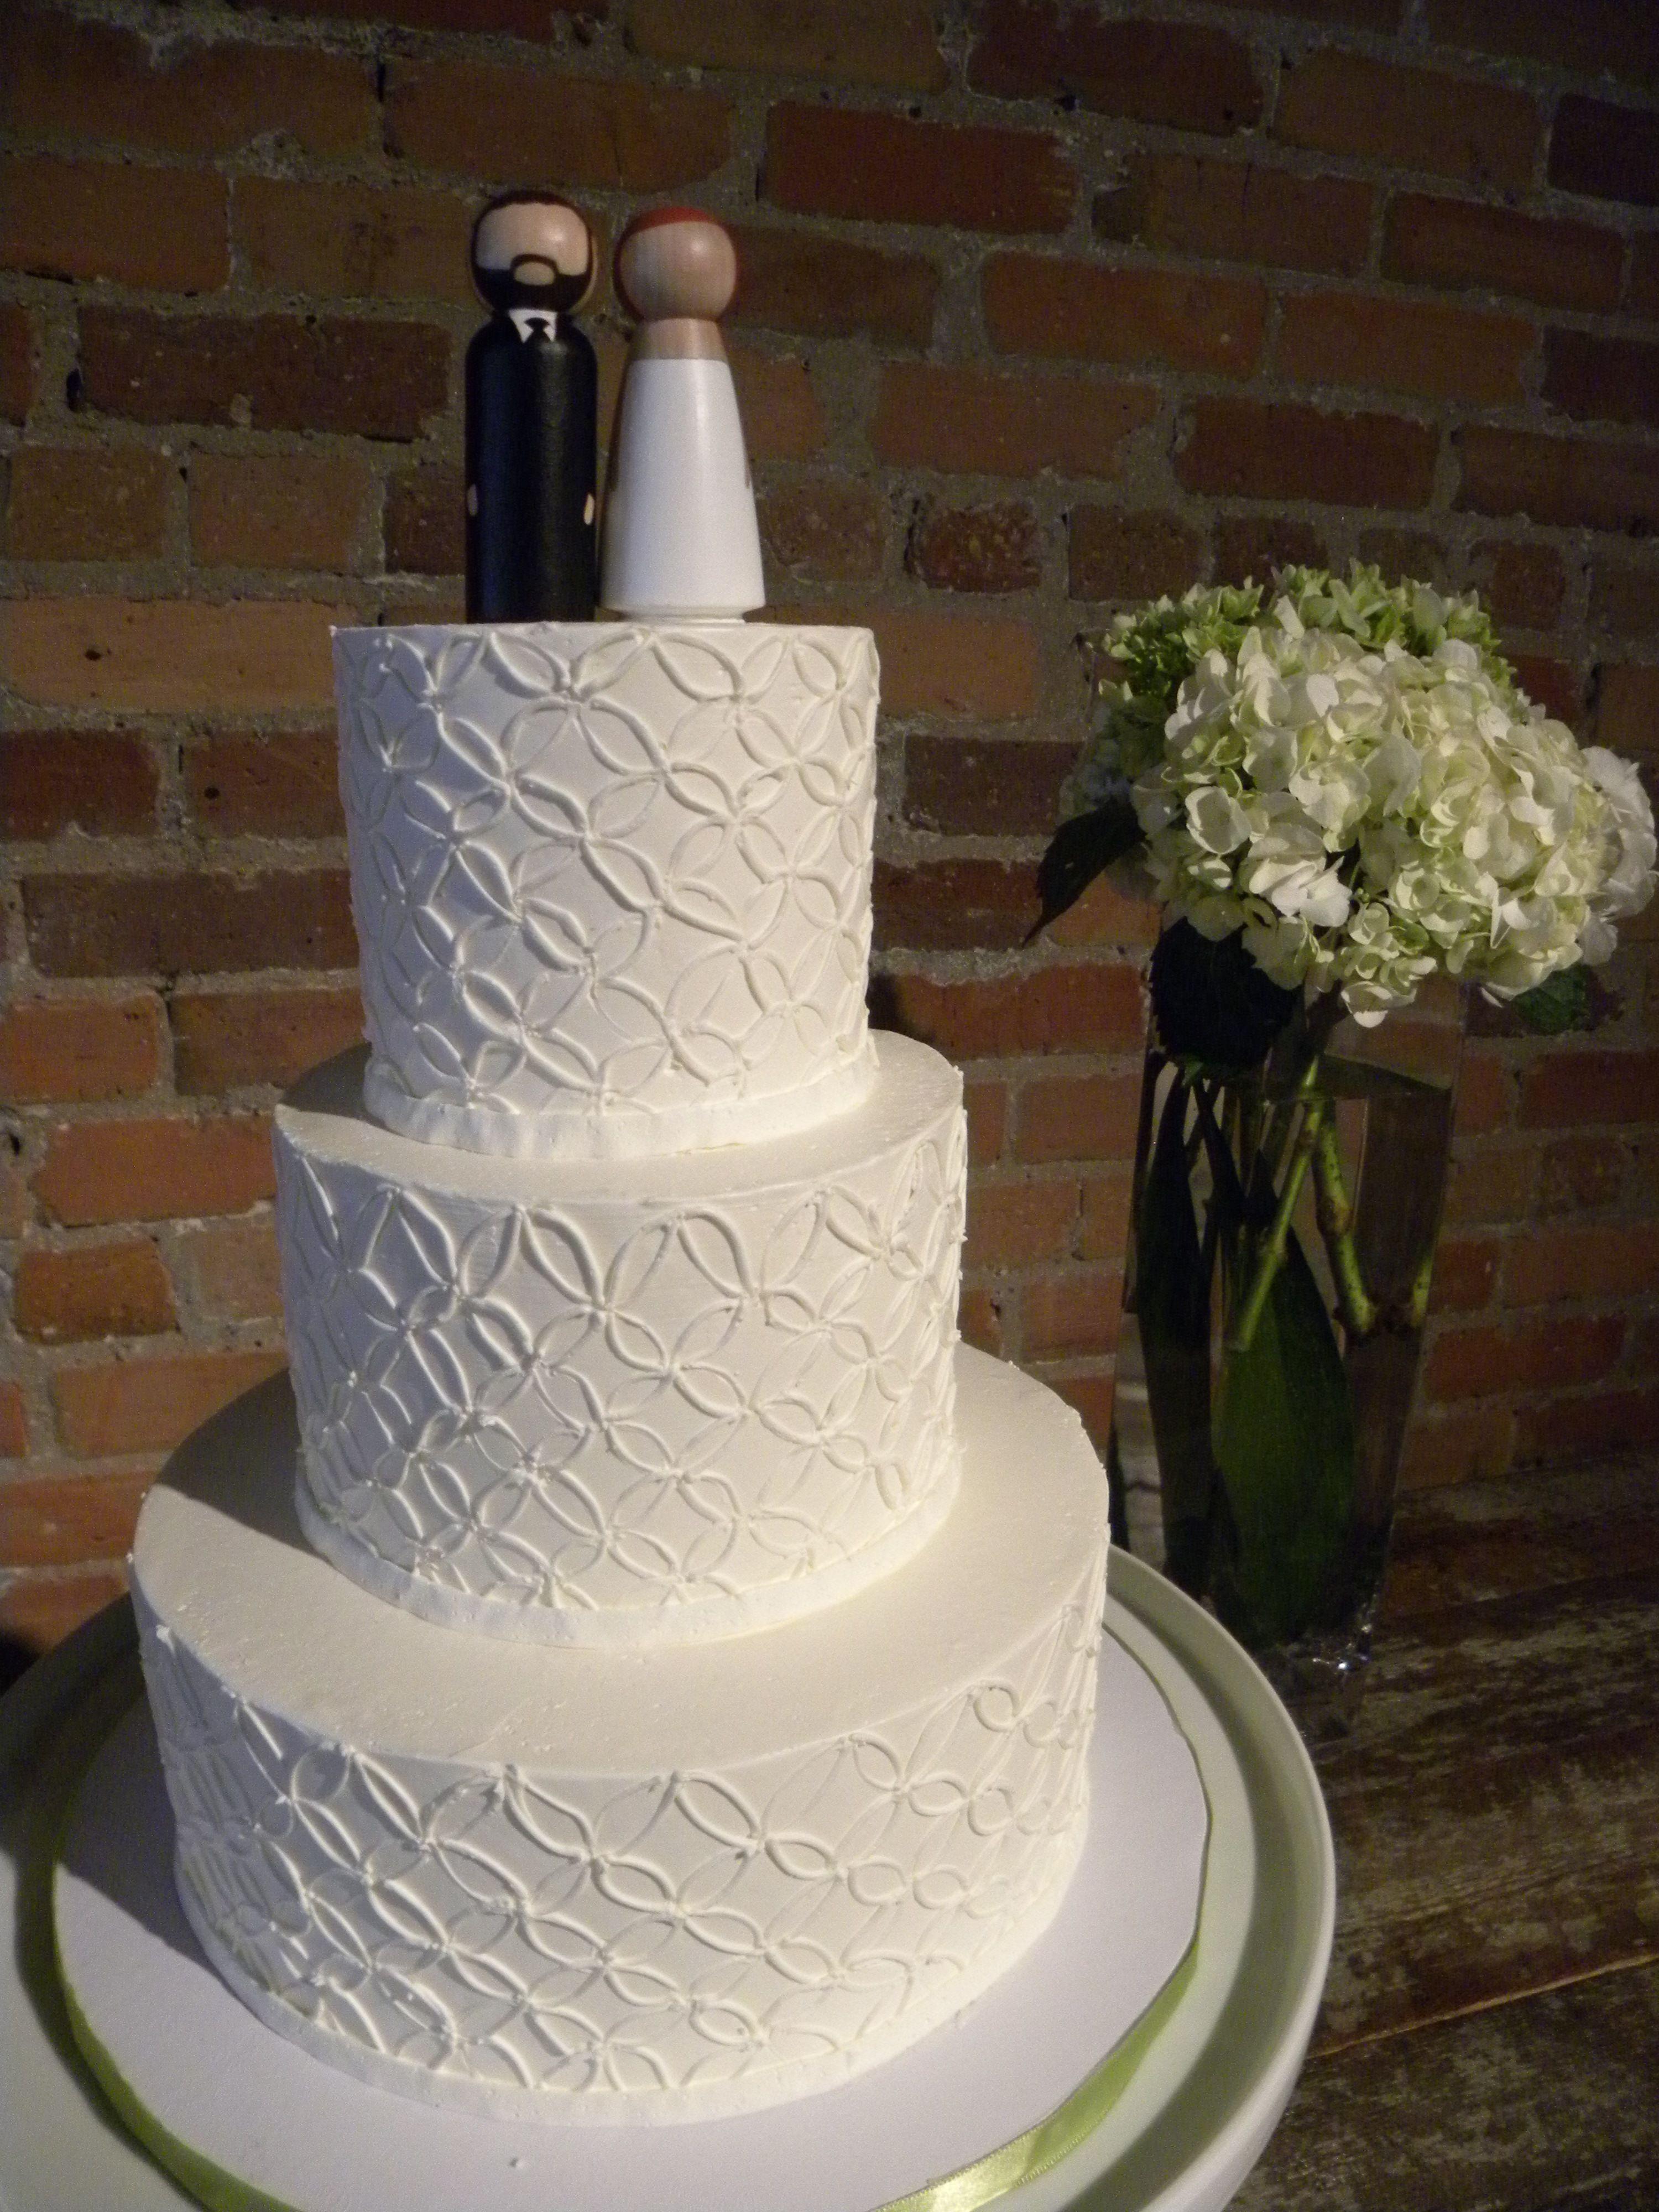 Asheville Wedding Cakes  Asheville Birthday Cakes Tiffany s Baking Co